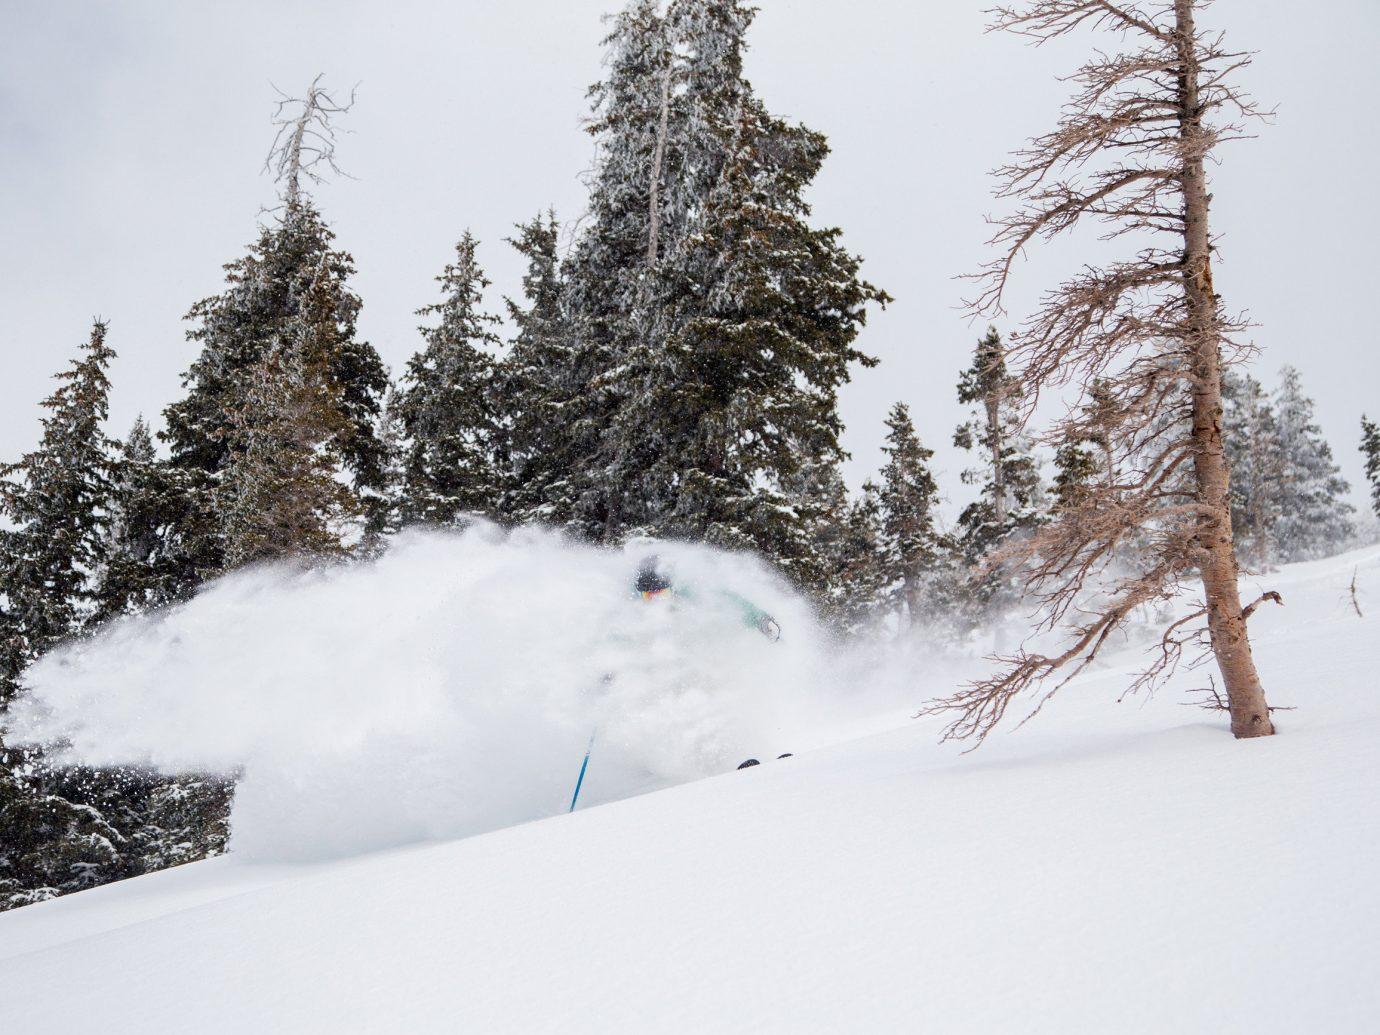 Man skiing on Bright Ski Resort slope